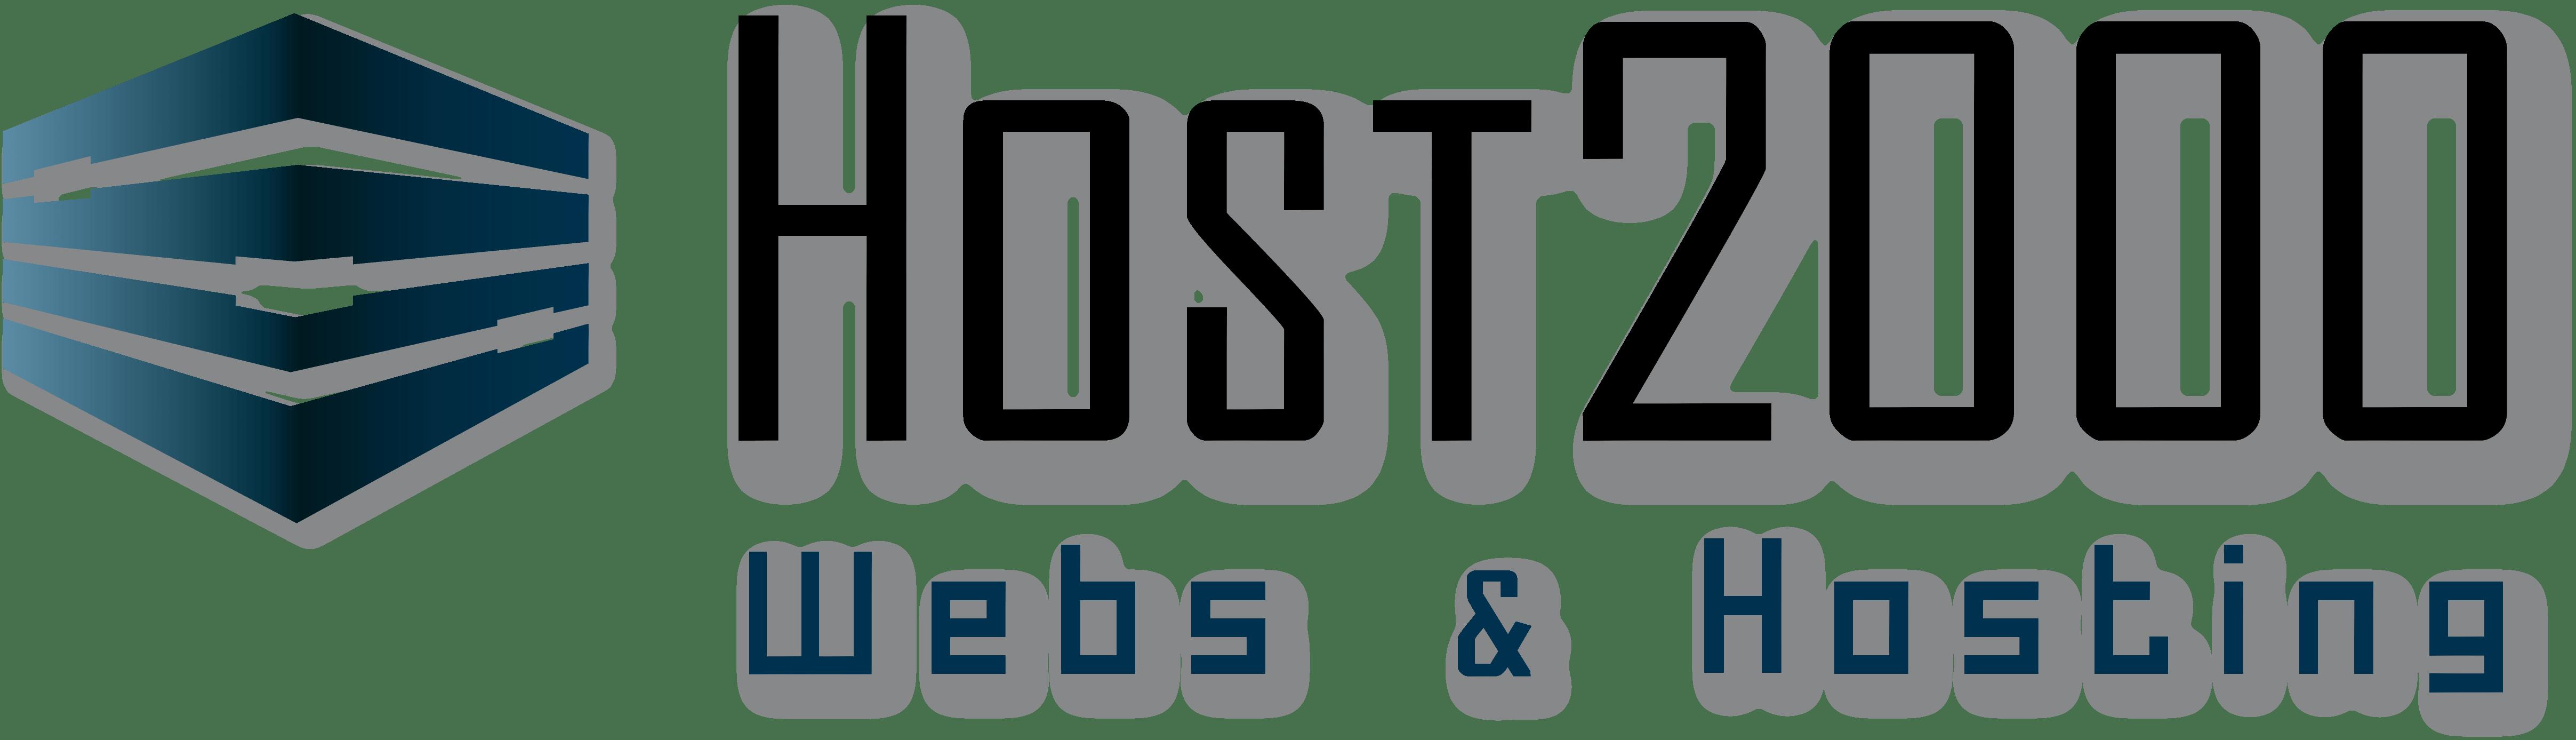 Host2000